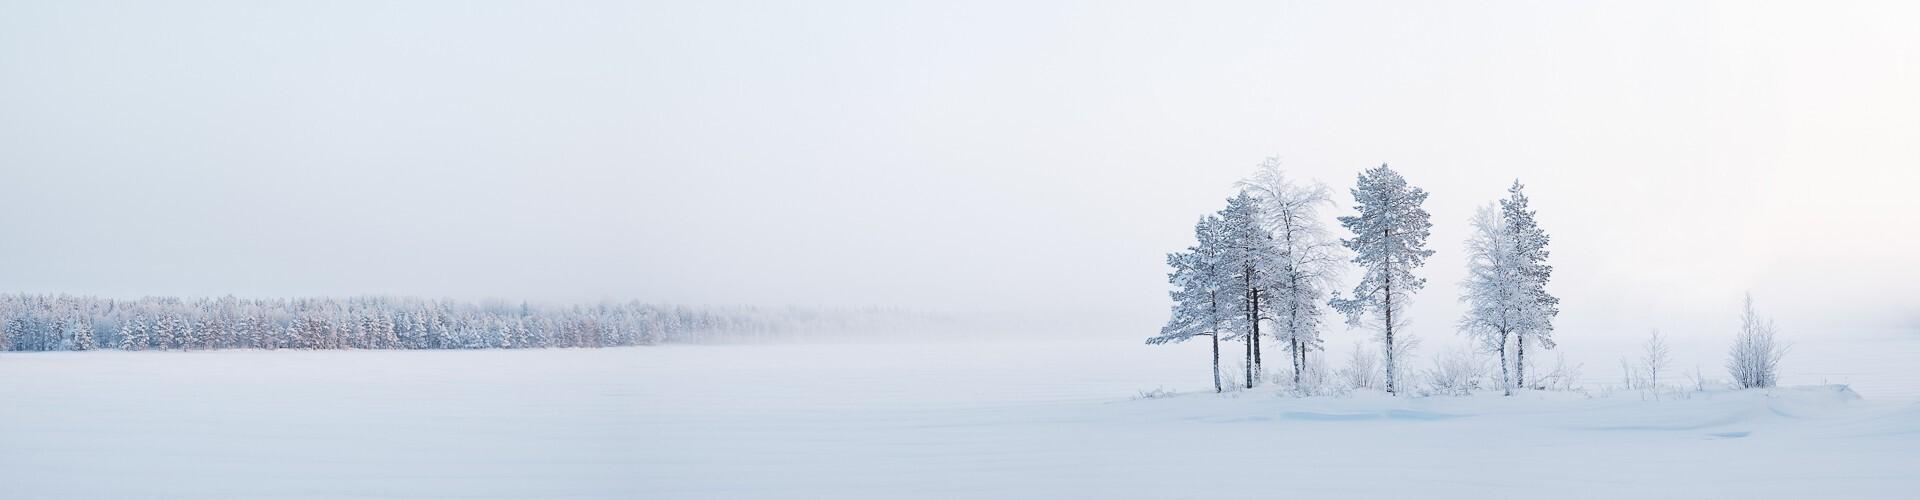 voyage photo blanc et minimalisme jean michel lenoir header